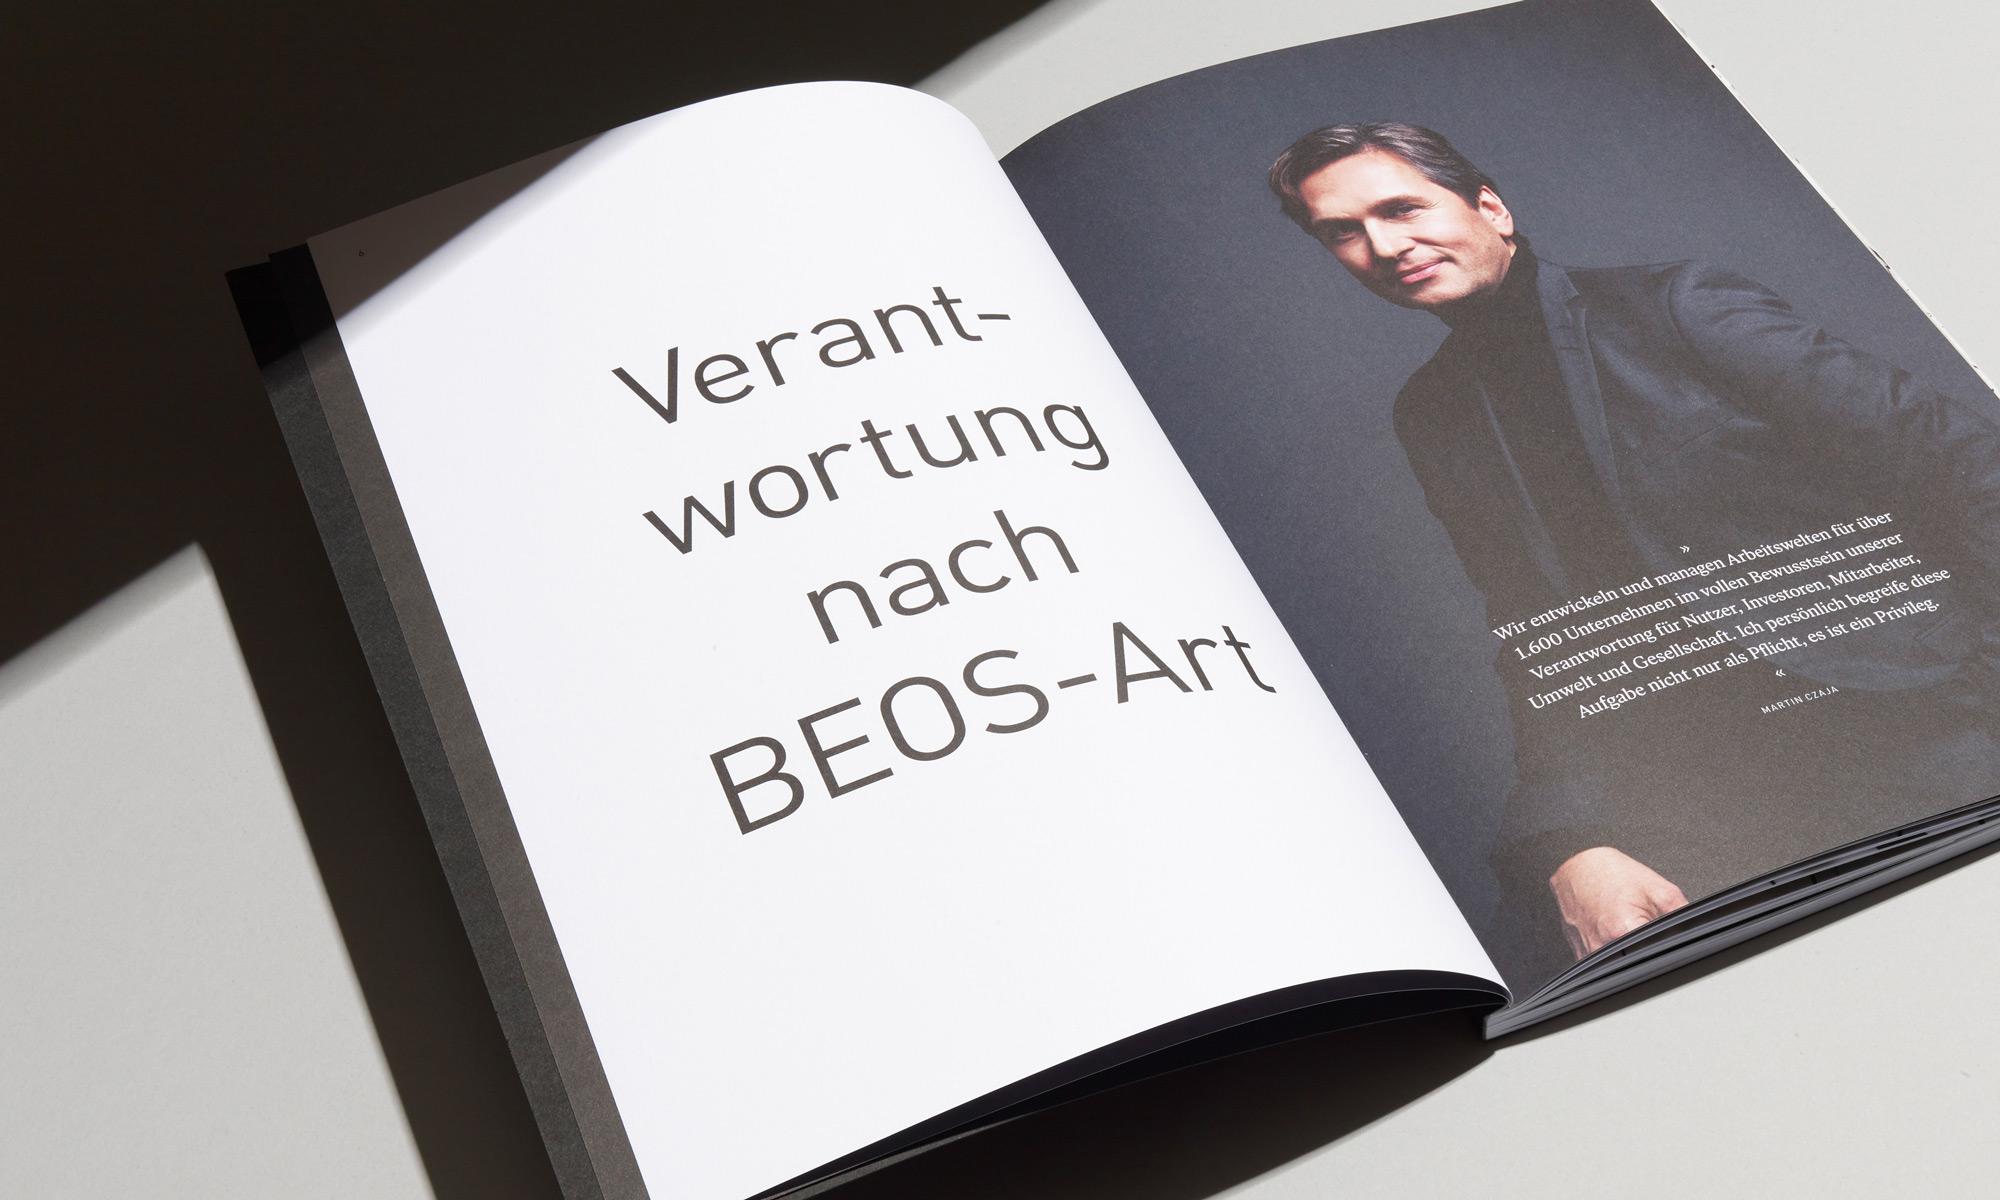 Beos Report 2020